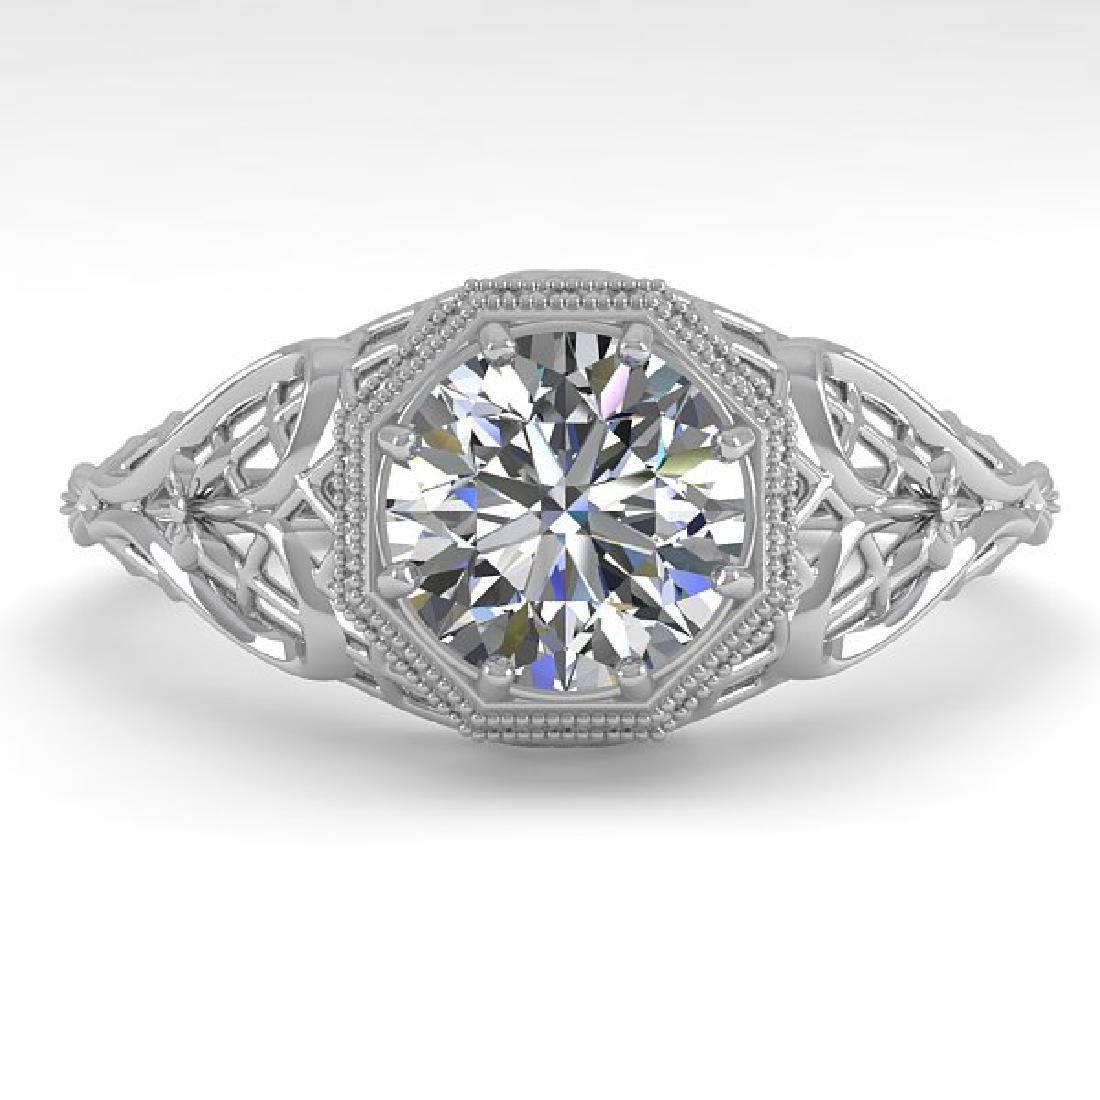 1.01 CTW VS/SI Diamond Solitaire Ring 14K White Gold